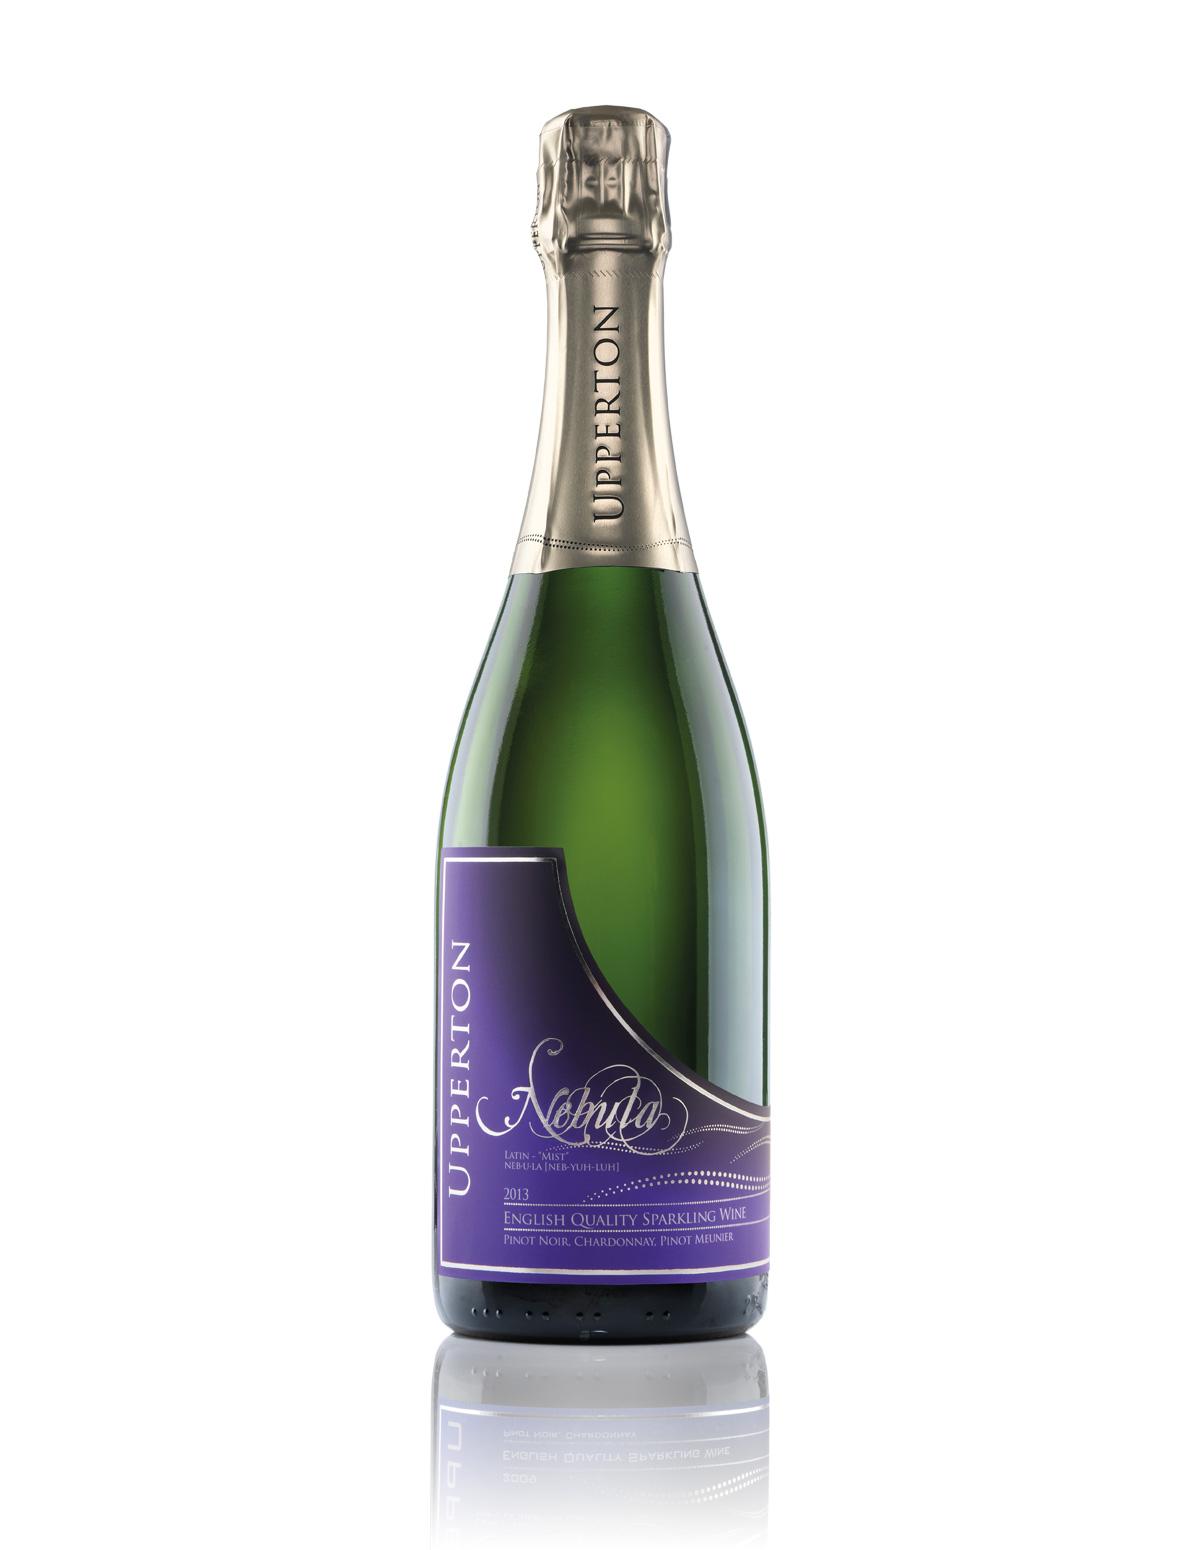 Upperton Nebula - Quality English Sparkling Wine